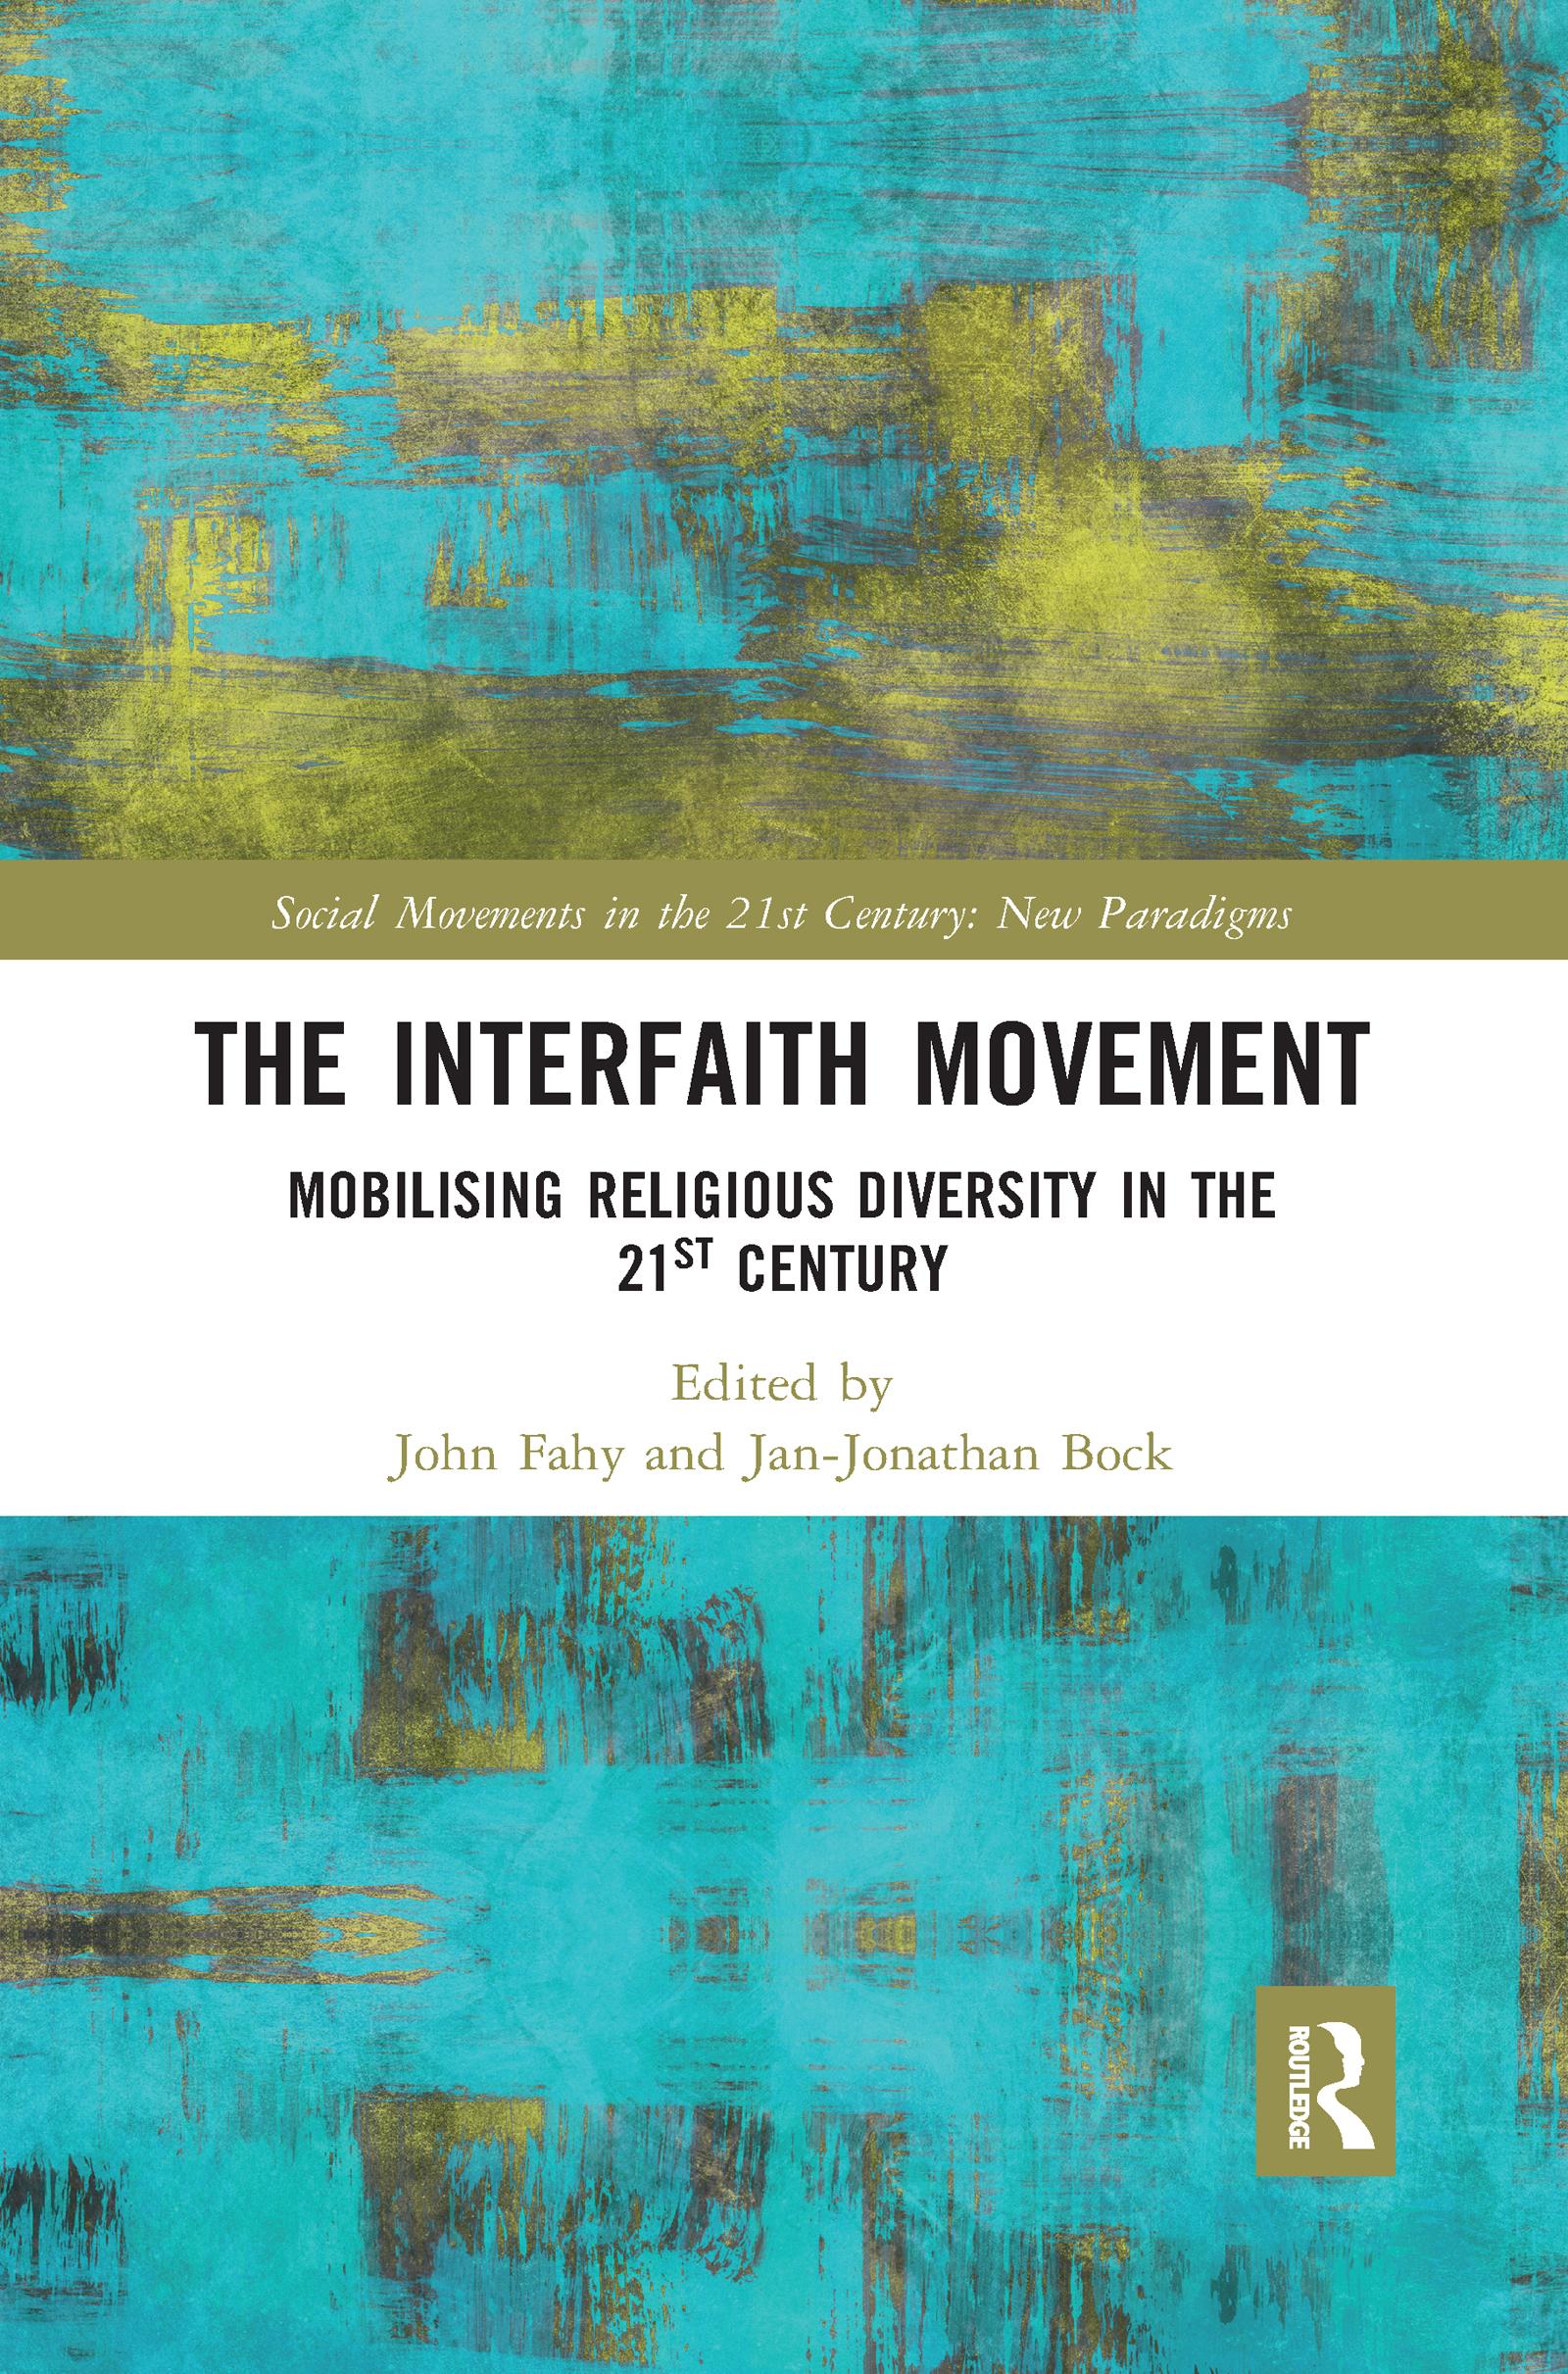 The Interfaith Movement